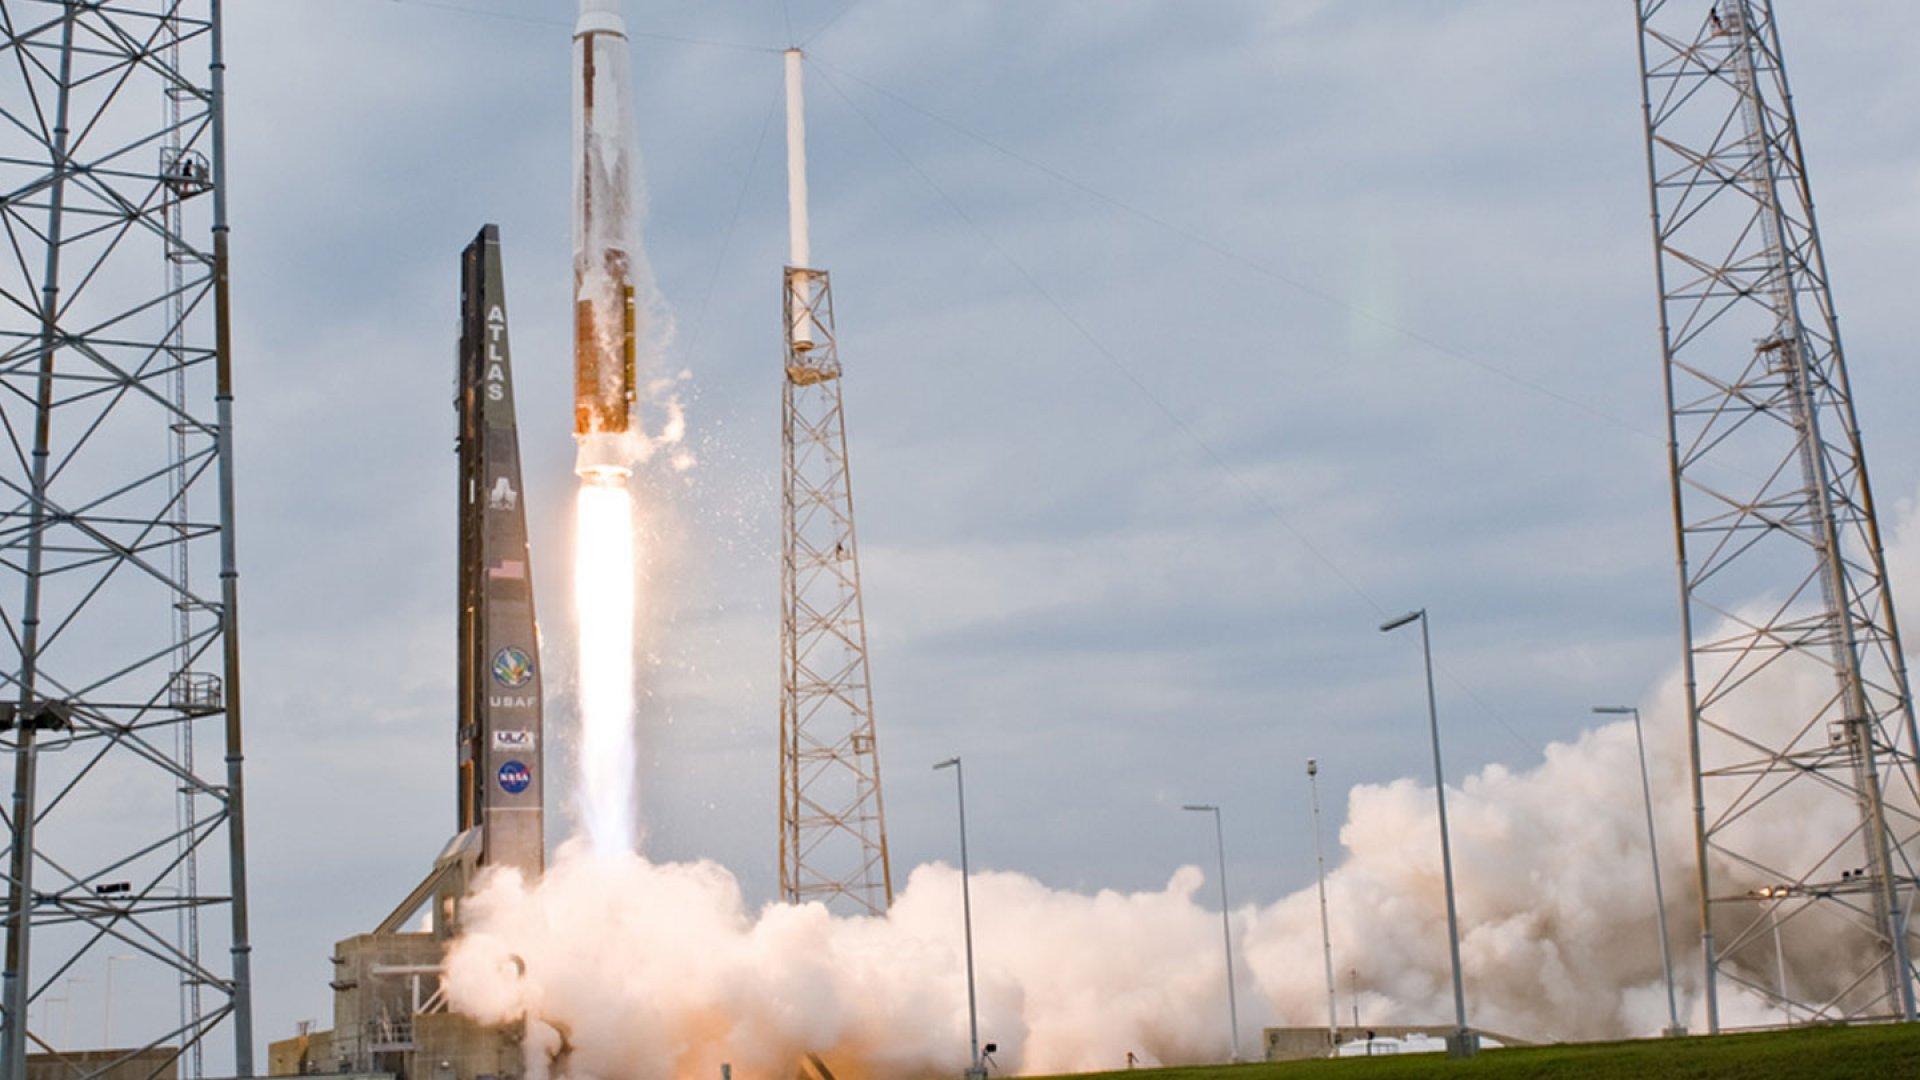 Calling All Innovators: NASA Wants Your Help